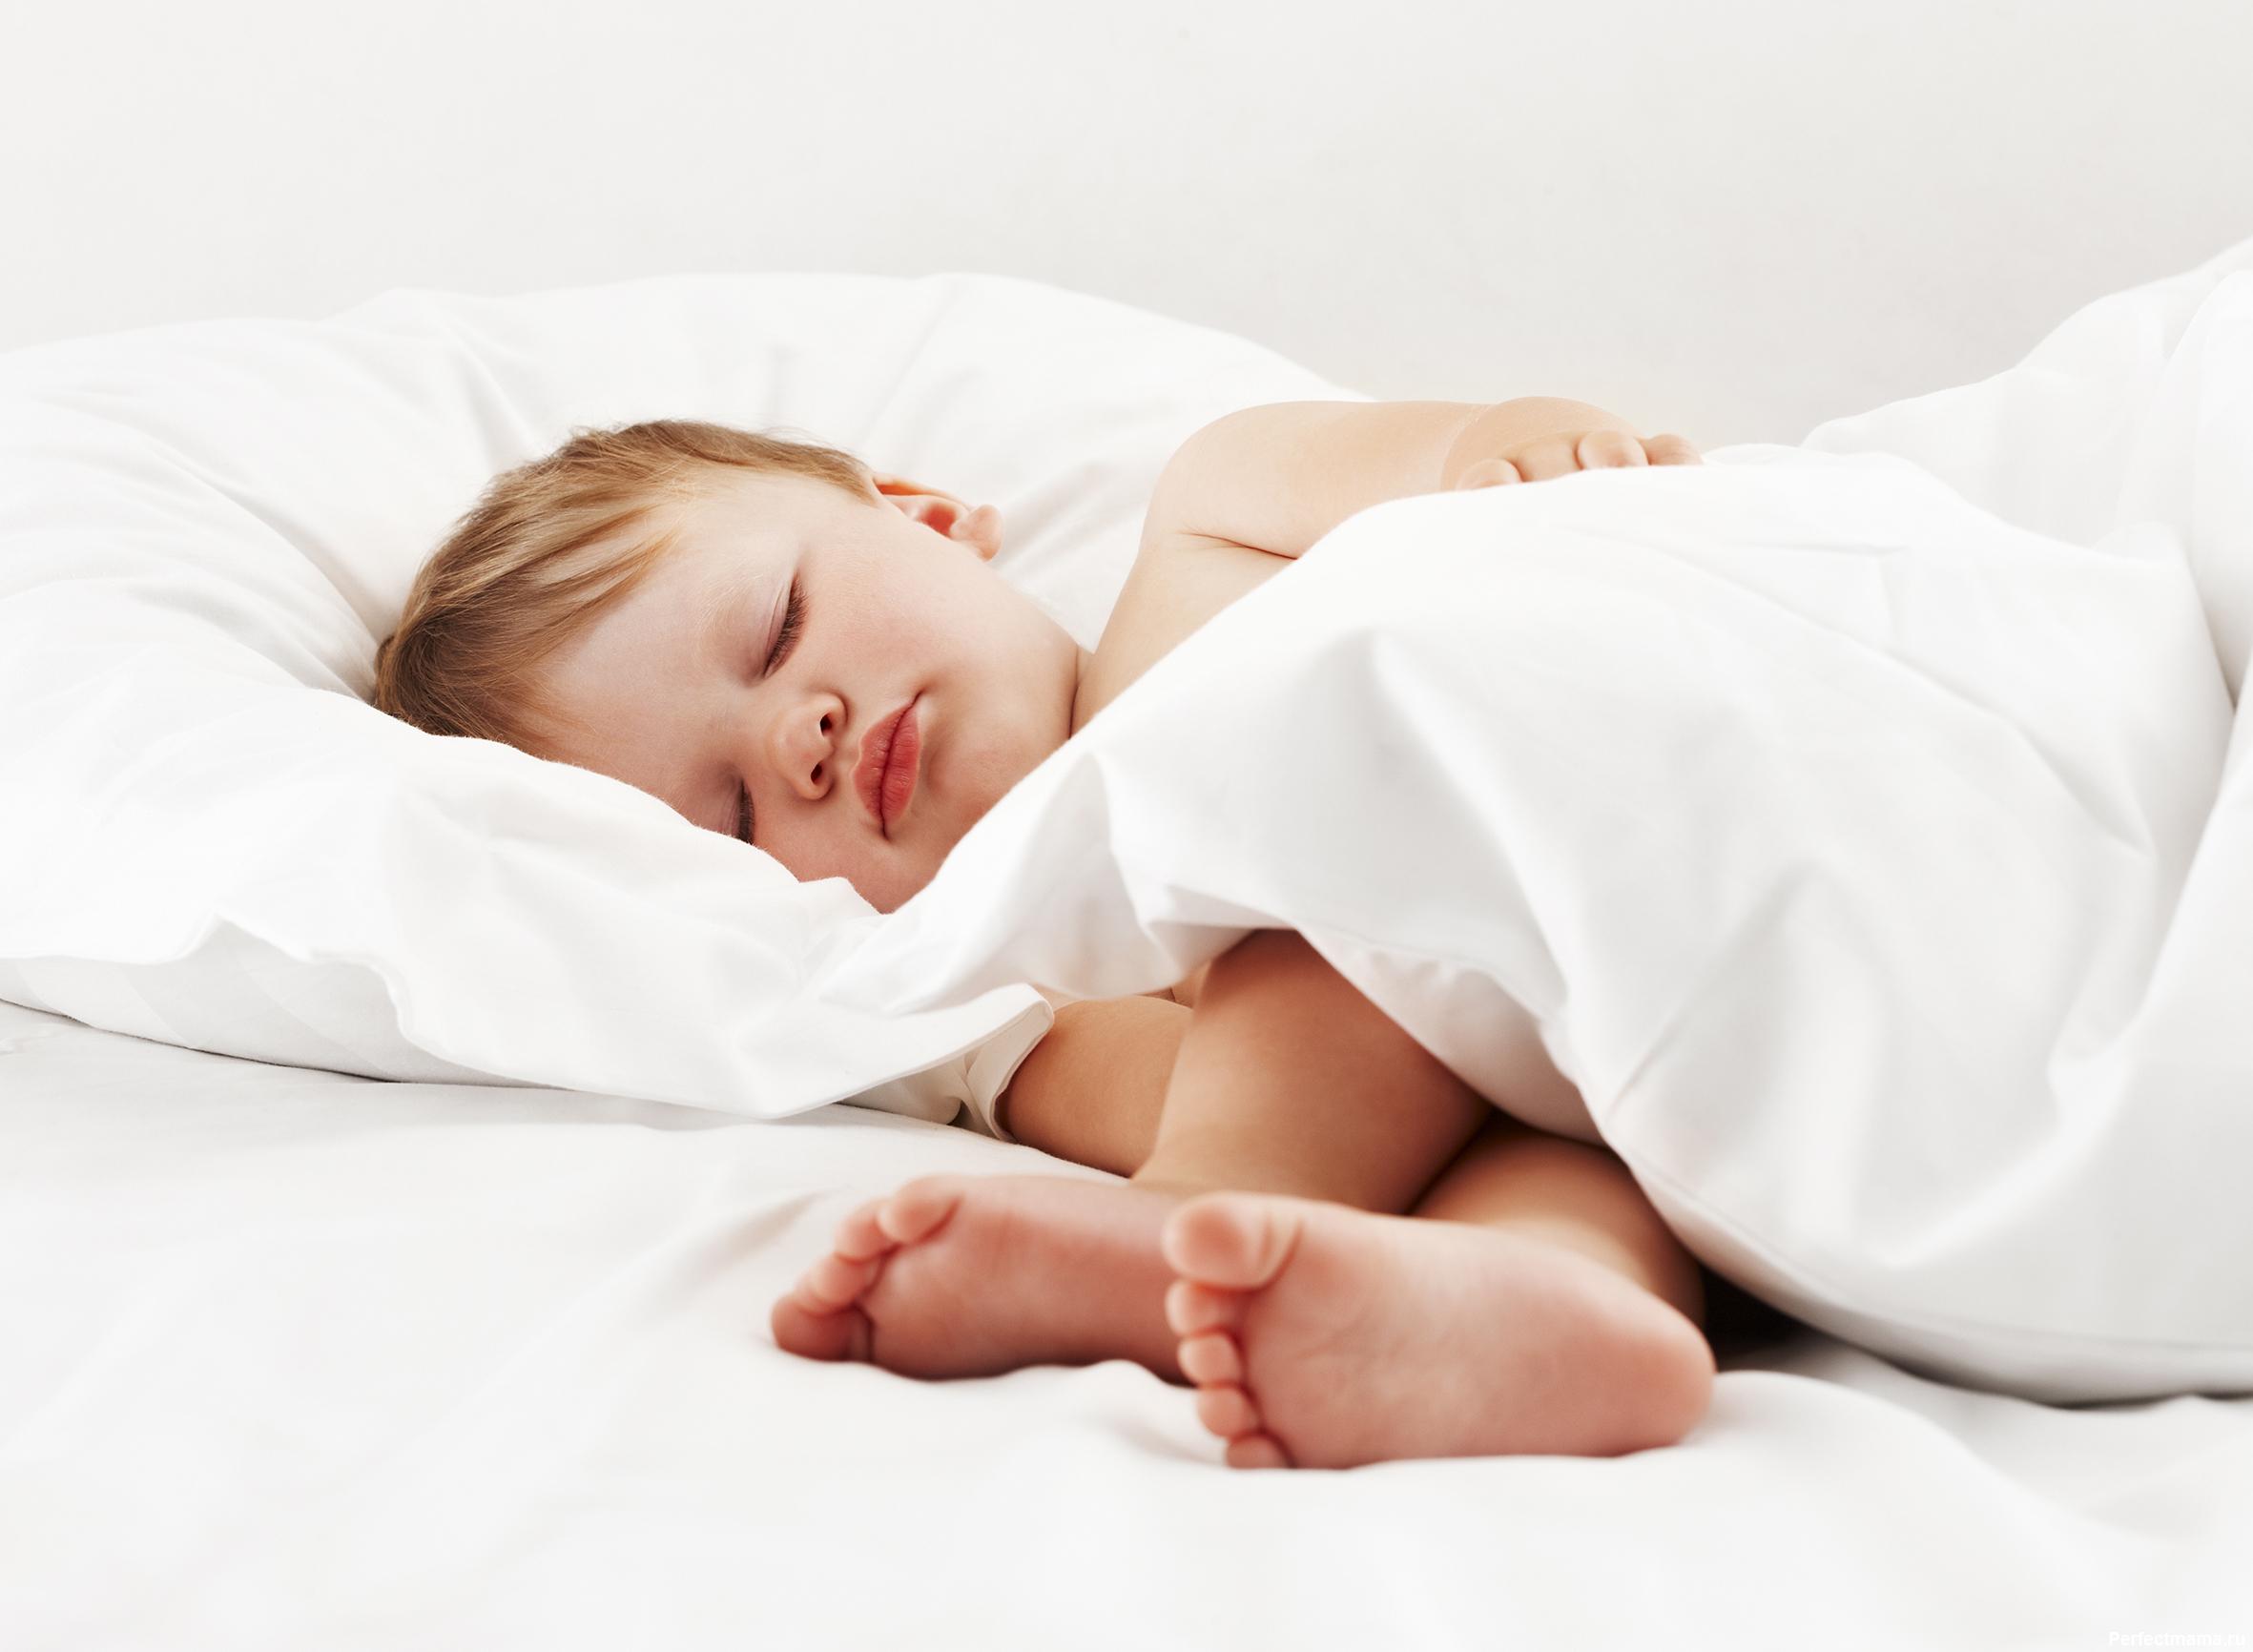 Baby lying on white sheet